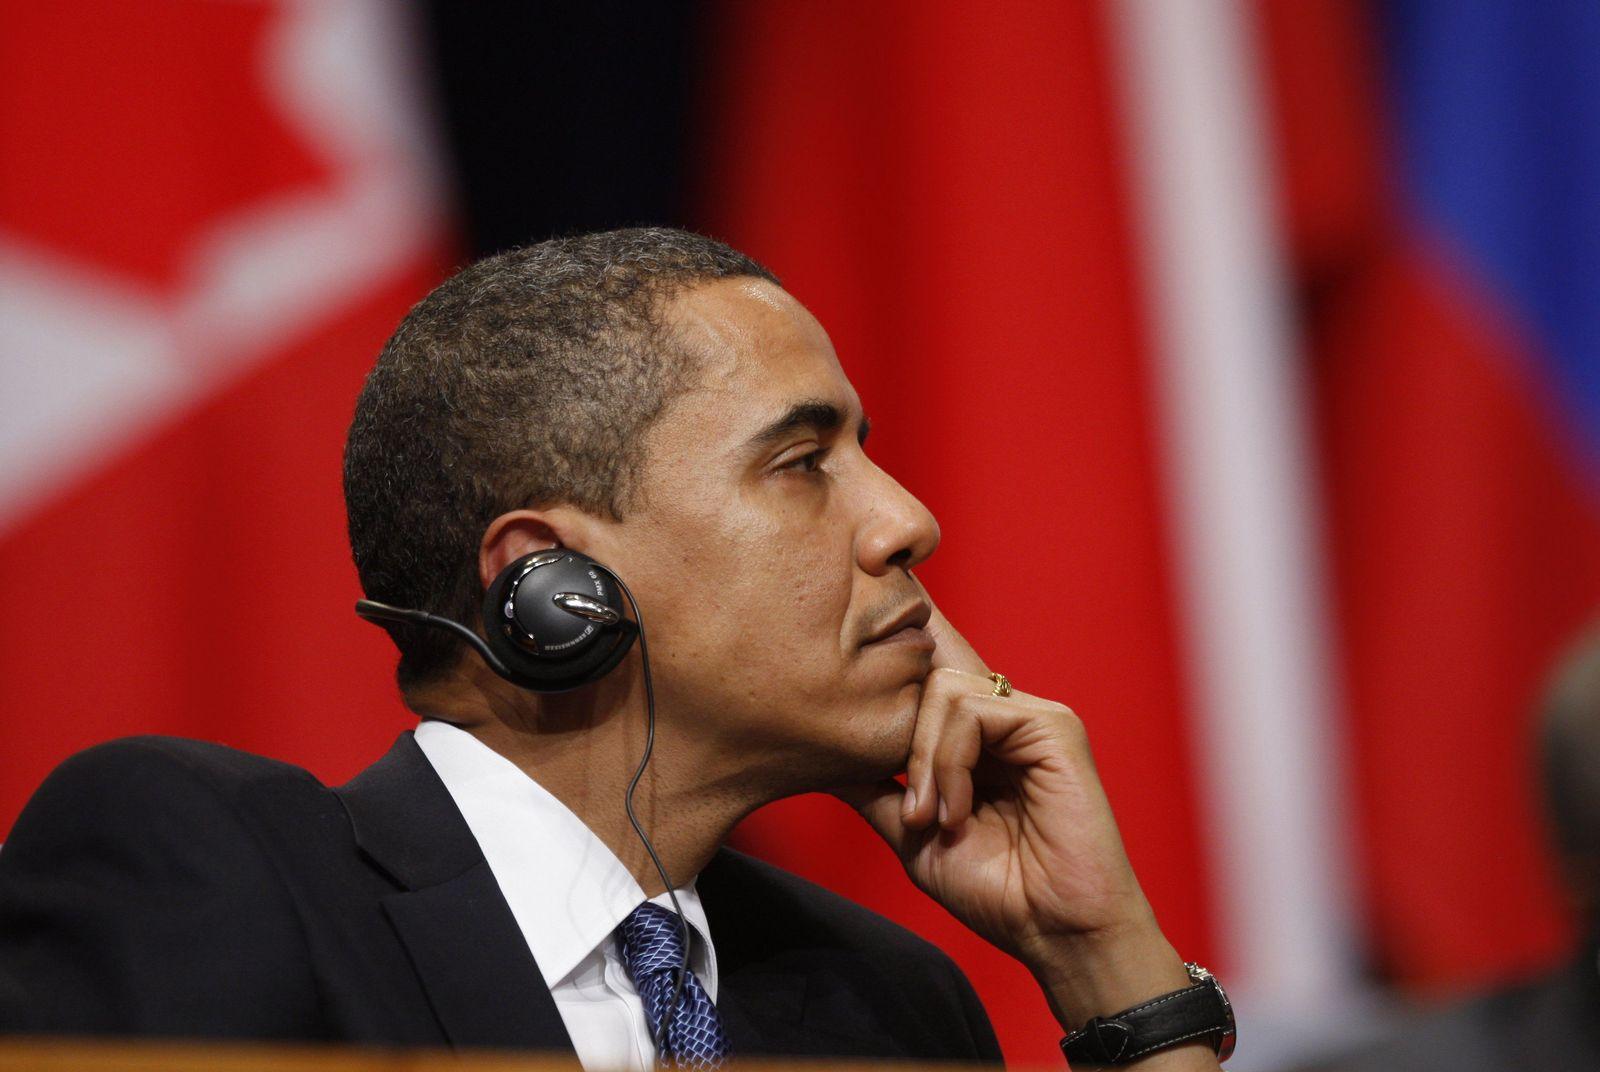 Obama / Kopfhörer